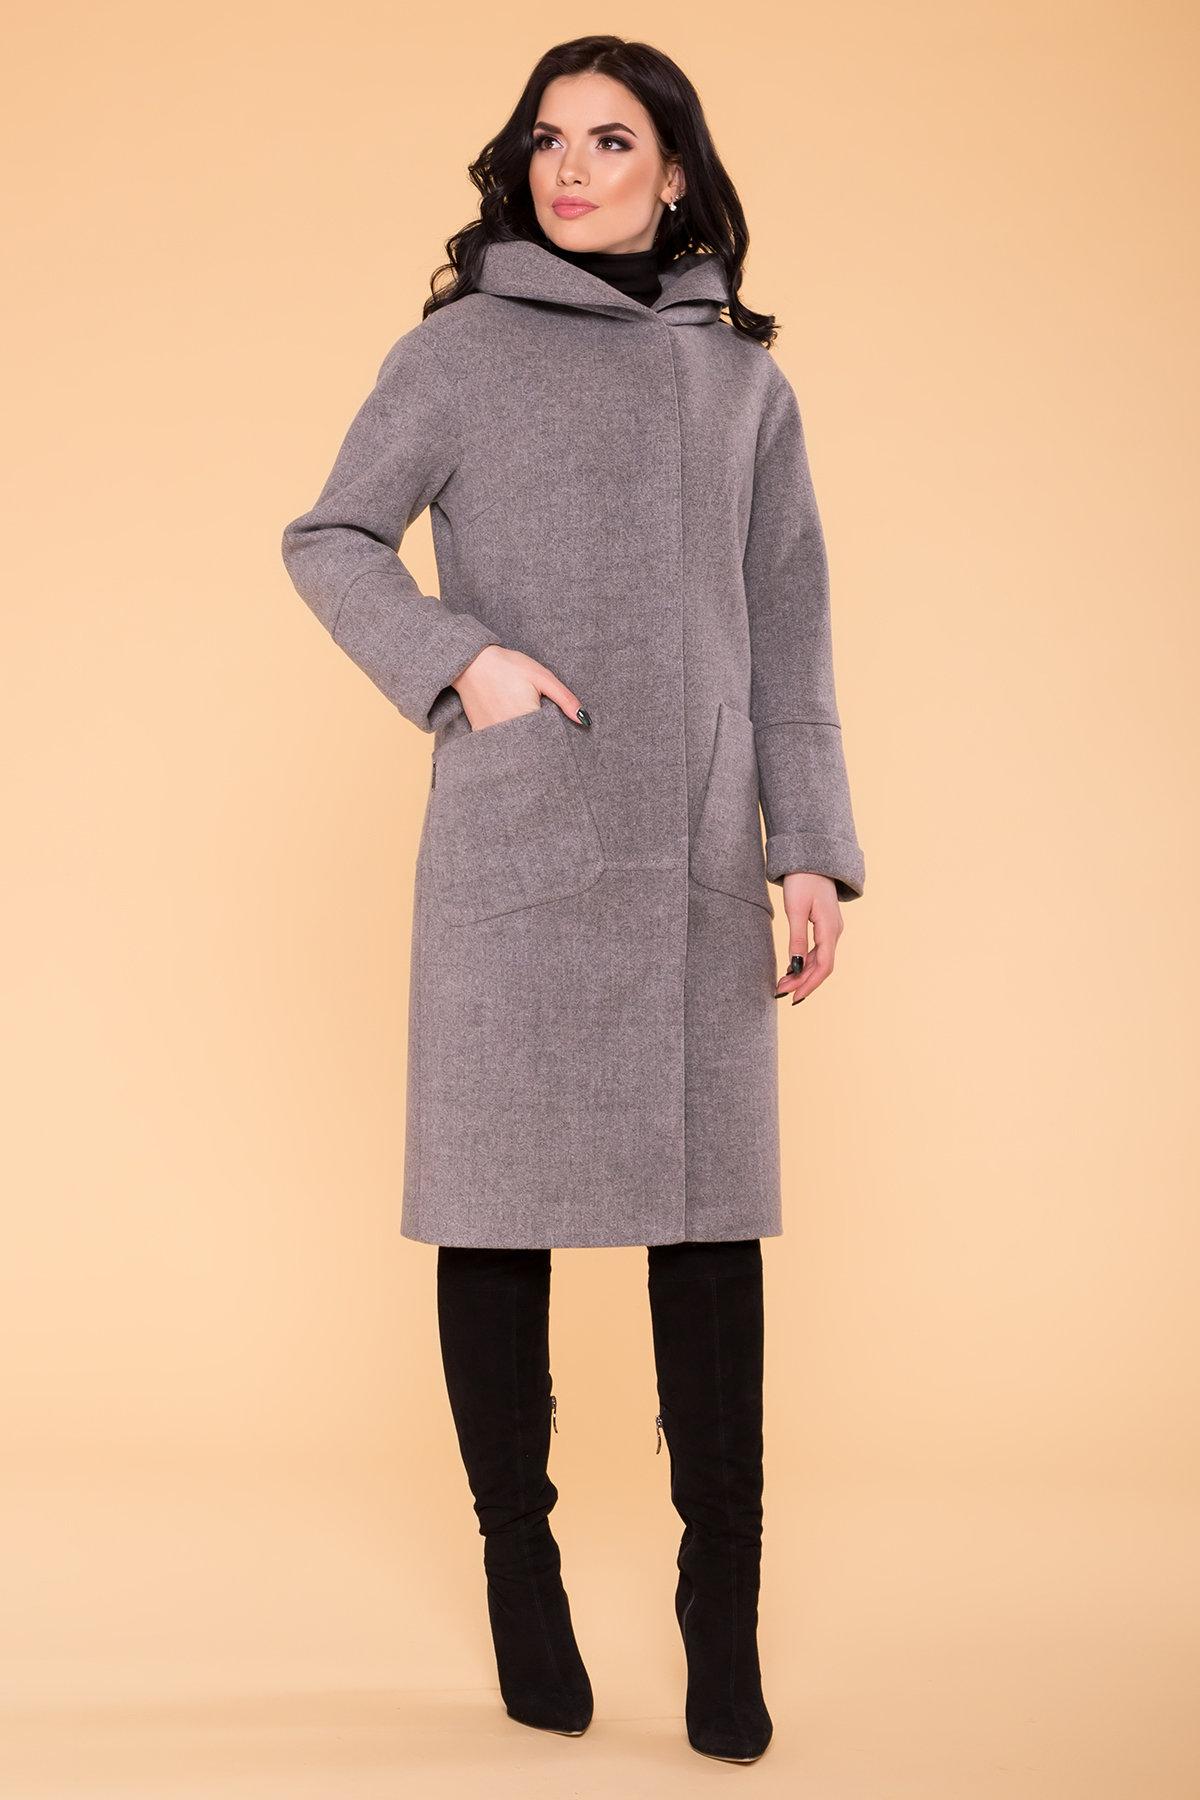 Пальто Анита 4462 Цвет: Серый 18